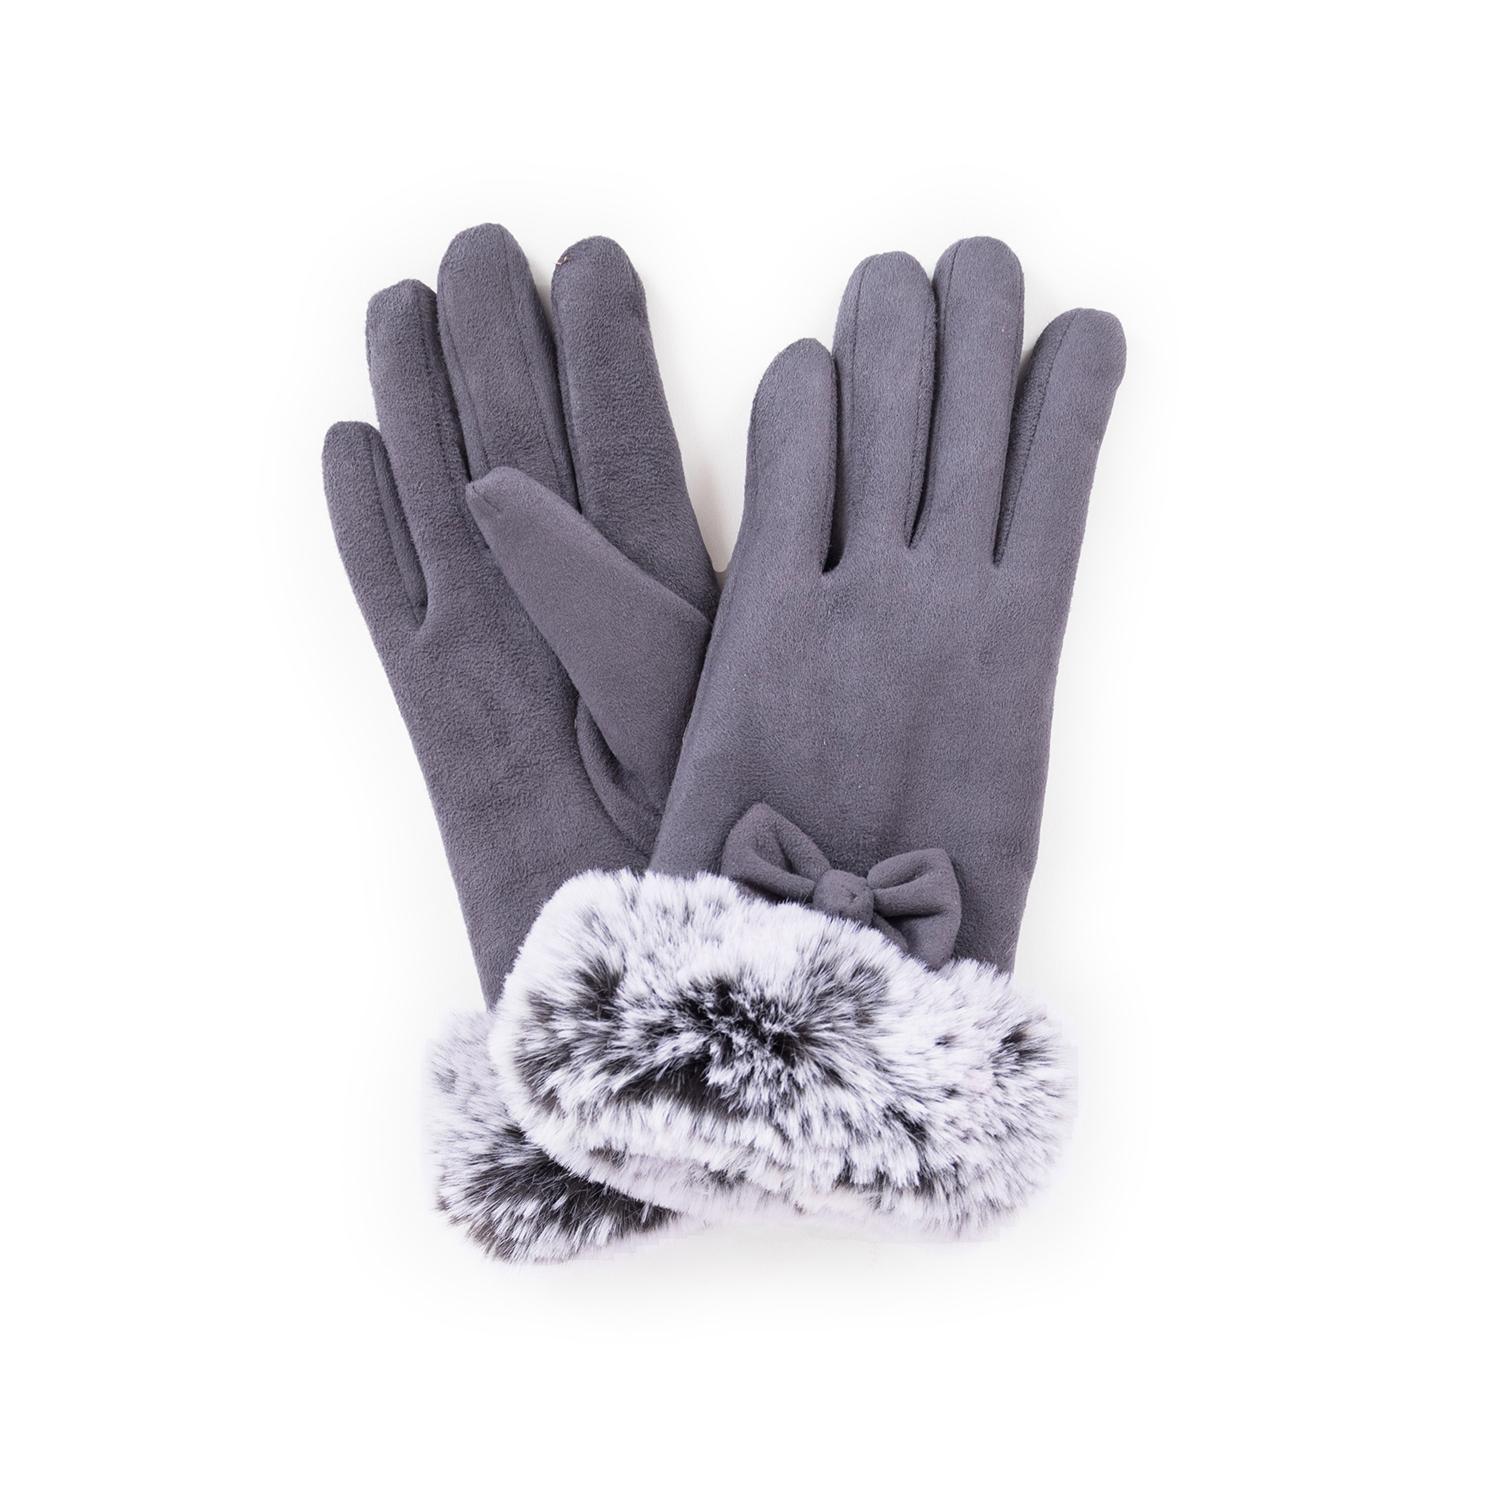 Powder – Charcoal Grey Faux Suede Phillipa Gloves in Powder Presentation Box